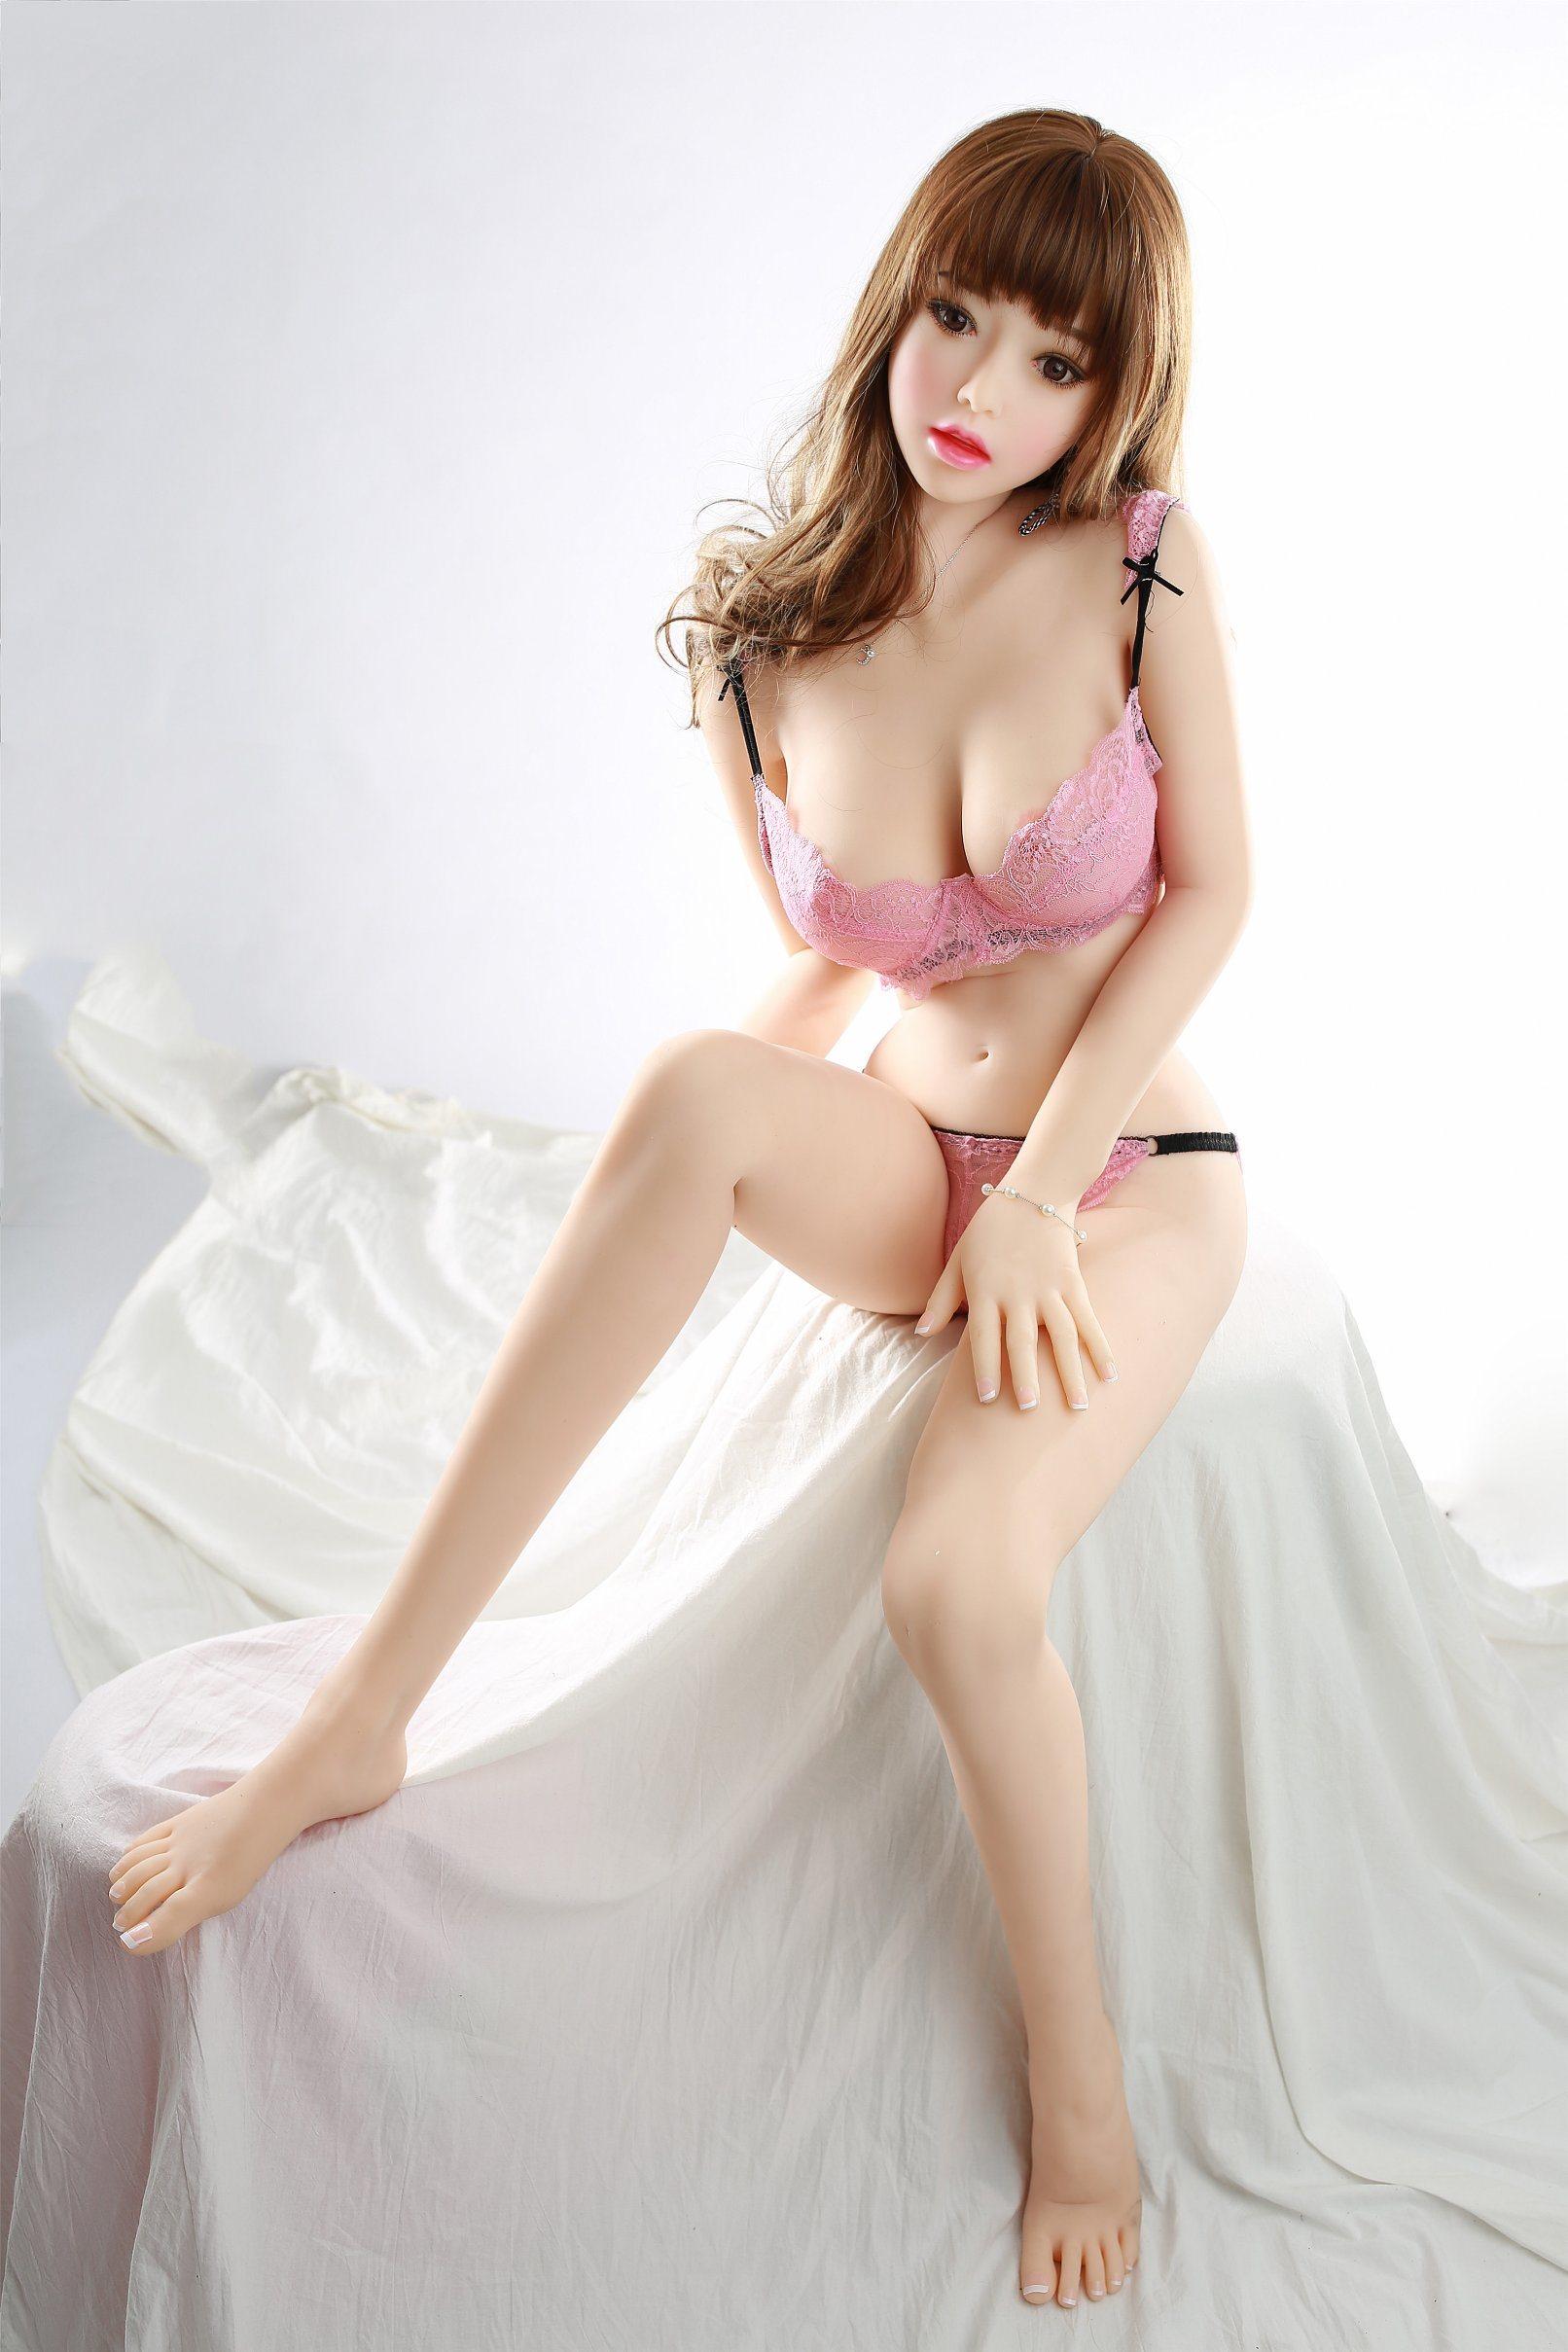 I Love Female Masturbation